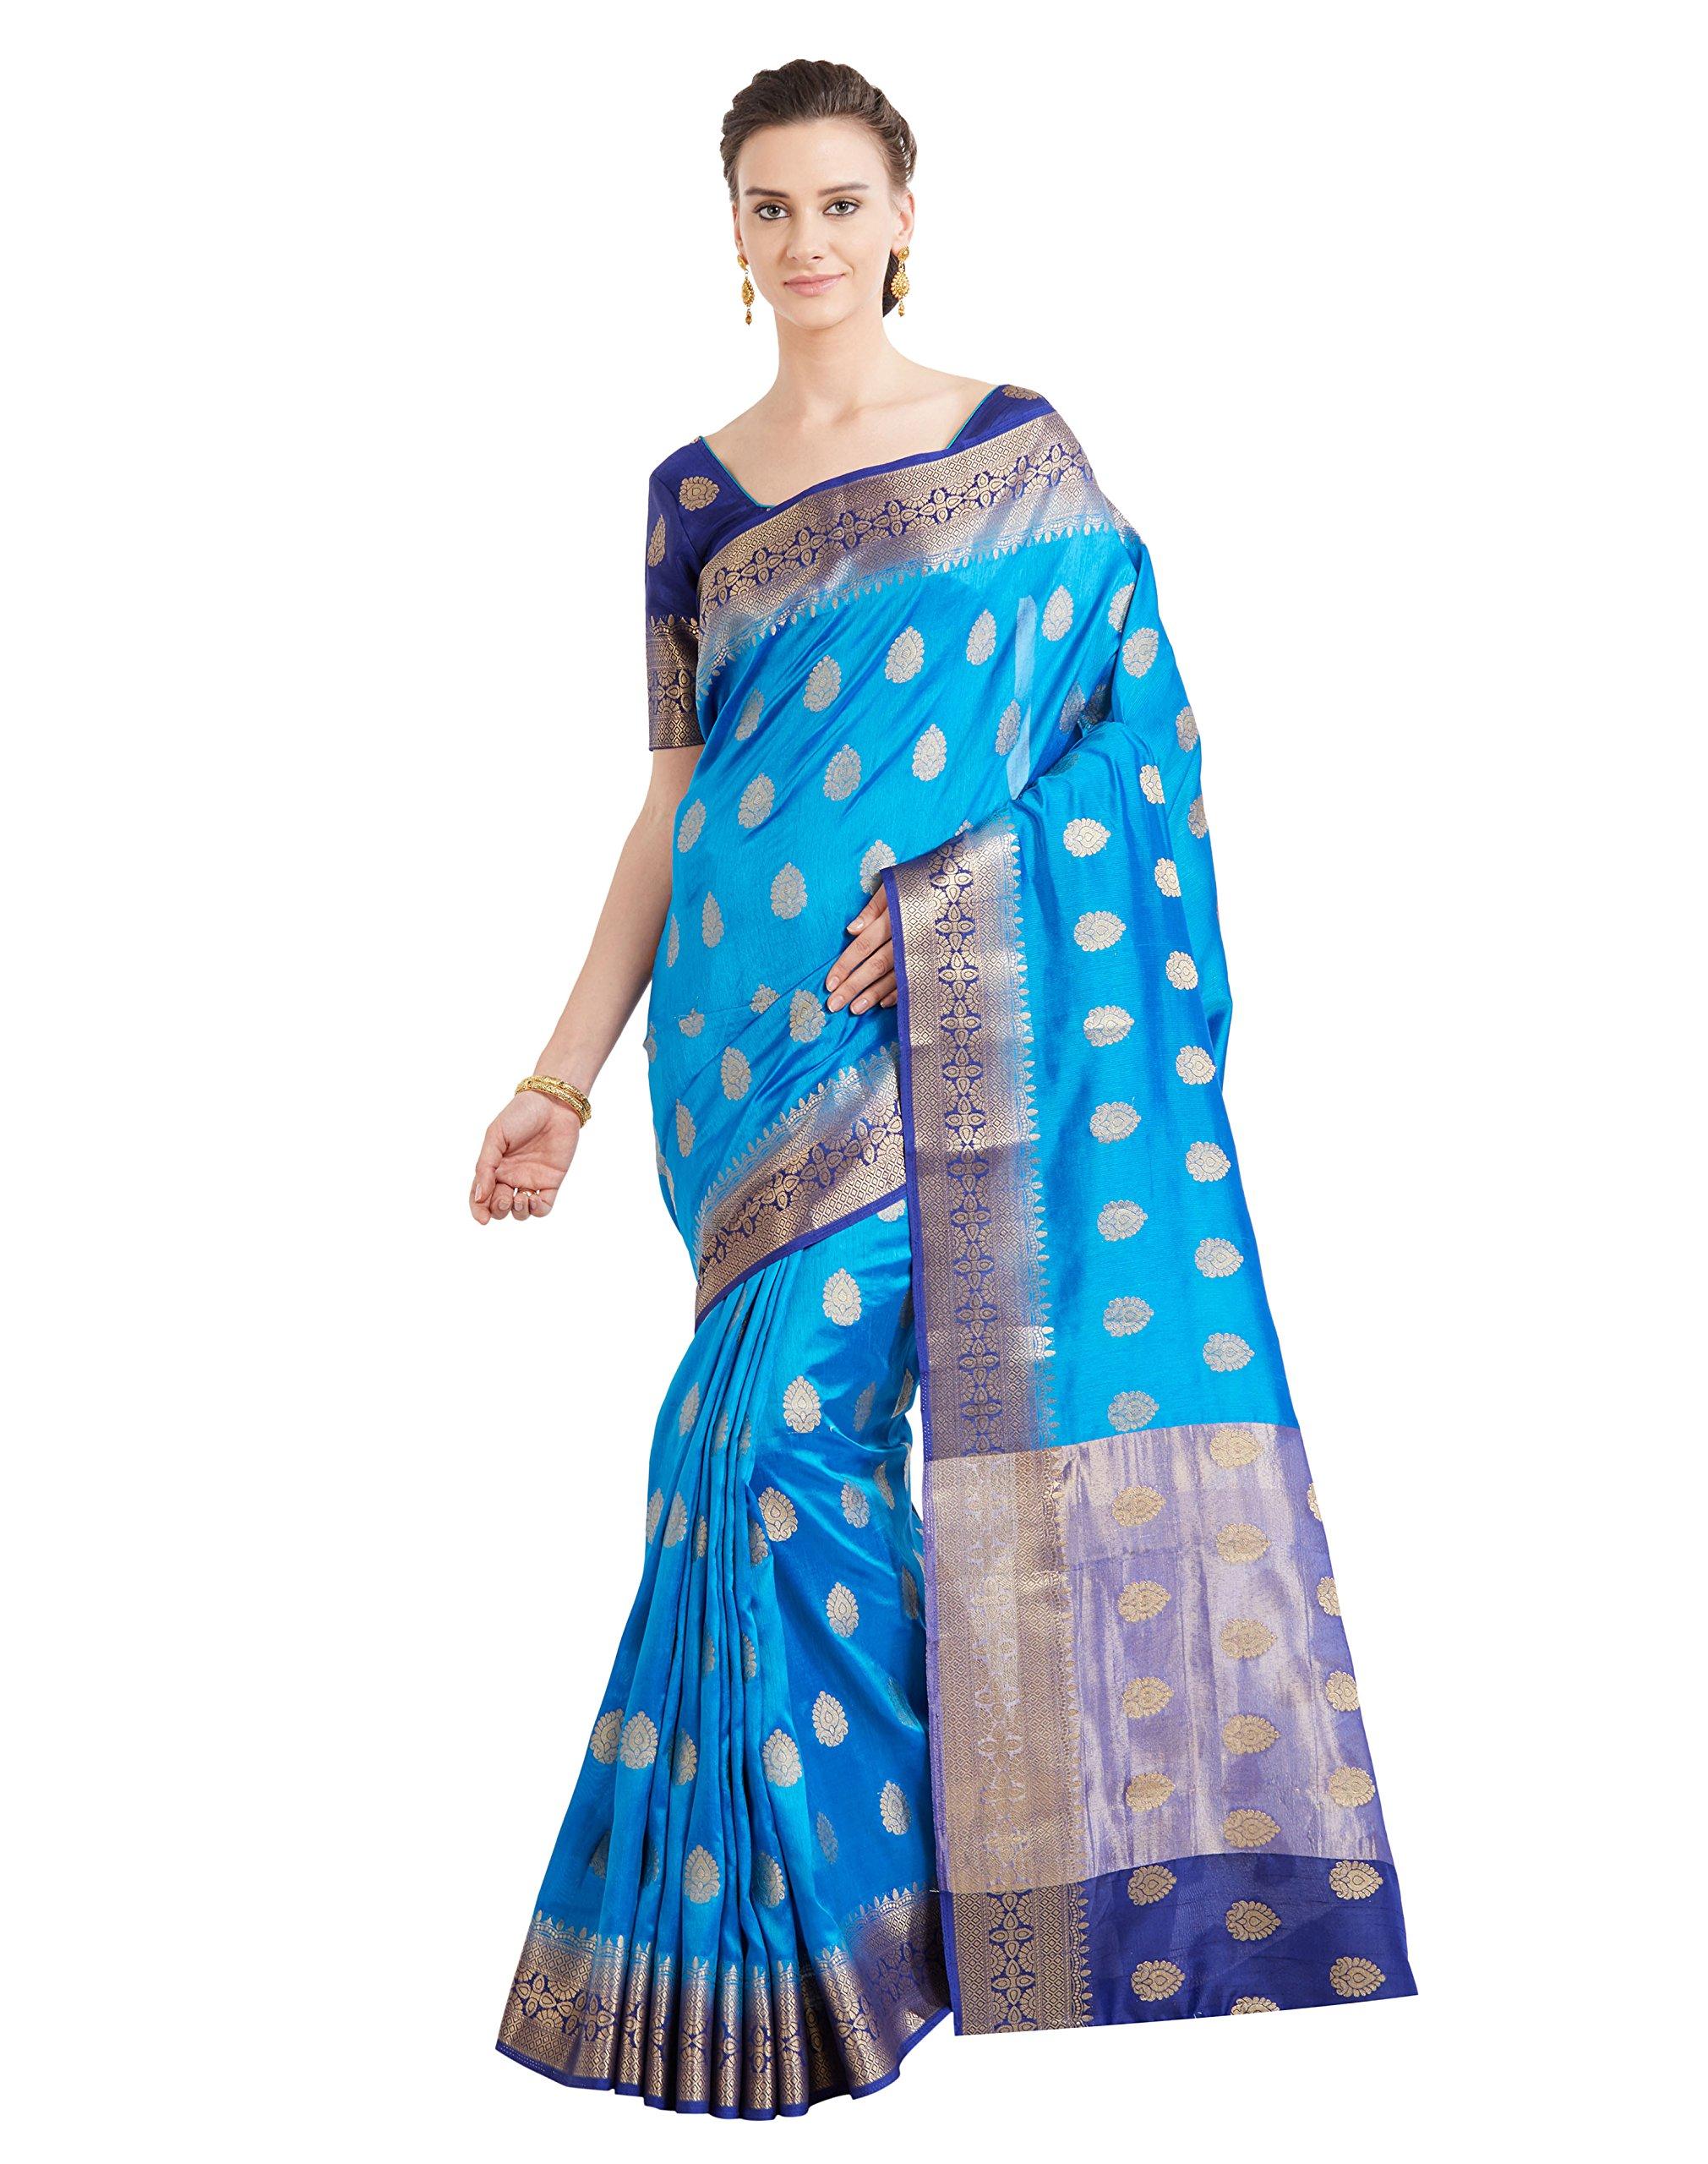 424cf7dad5 Galleon - Viva N Diva Sarees For Women's Banarasi Party Wear Blue Colour  Banarasi Art Silk Saree With Un-Stiched Blouse Piece,Free Size